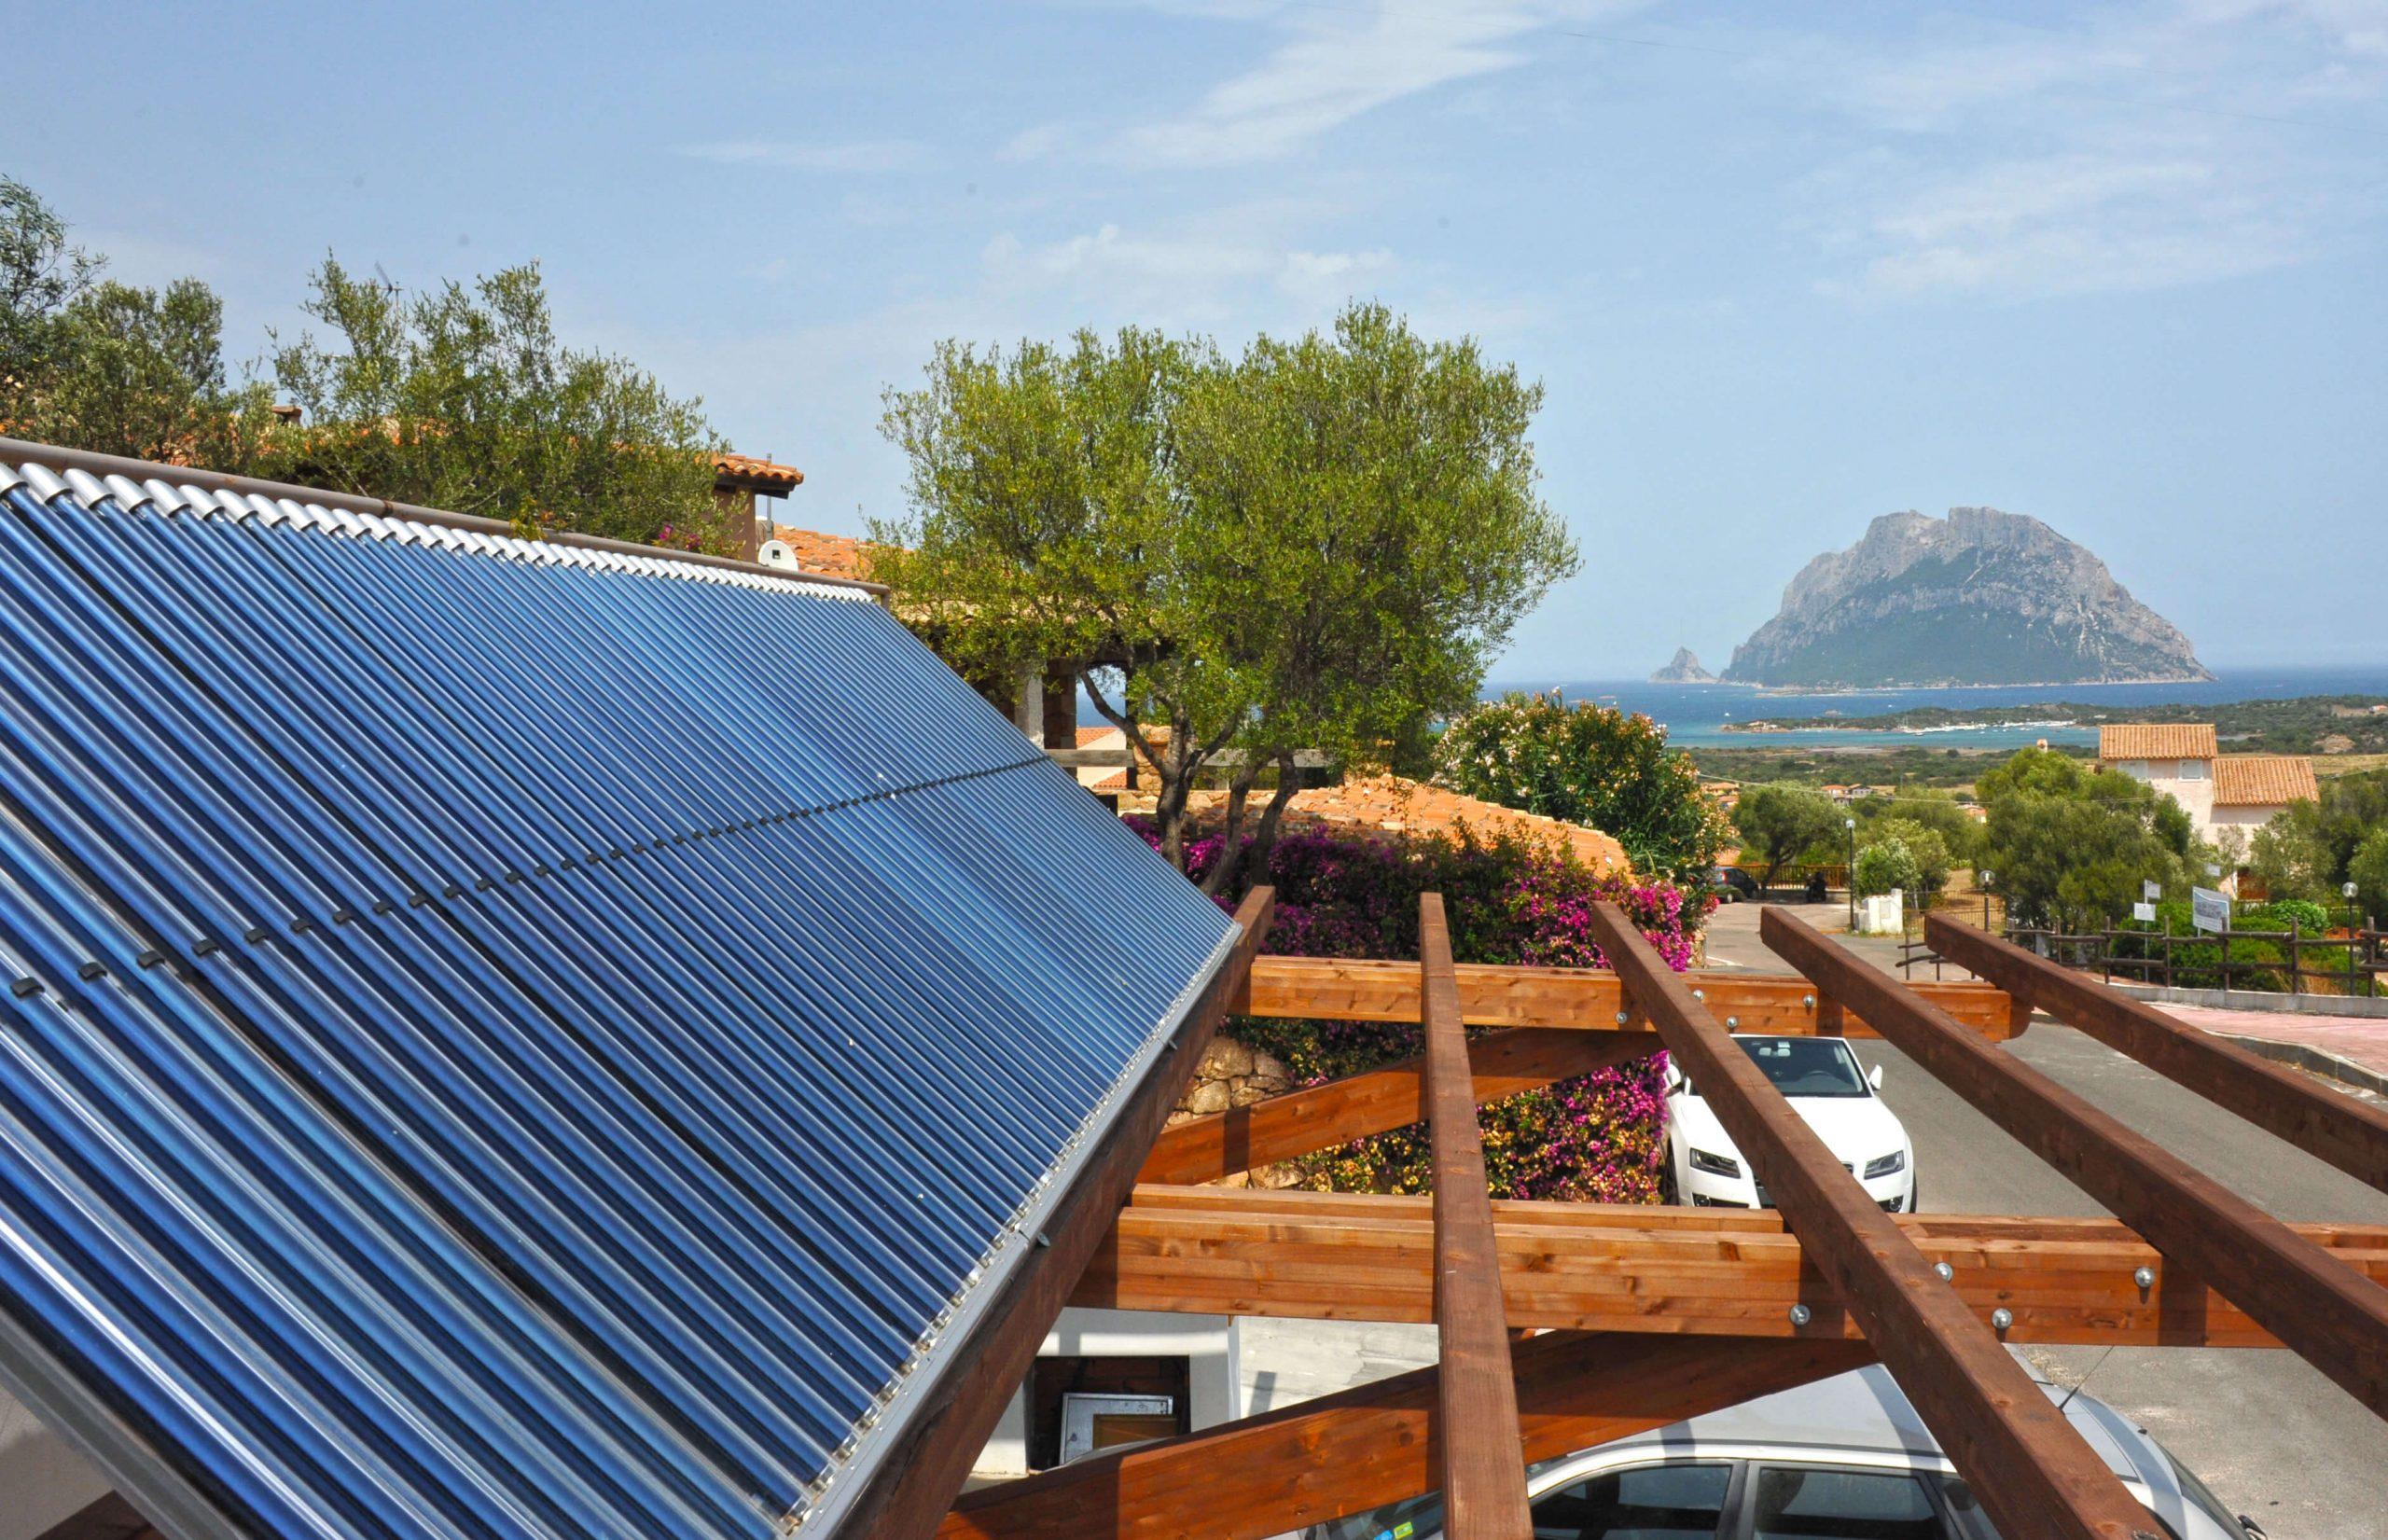 Tubo II & C &T : Innovative Röhrenkollektoren in Sardinien